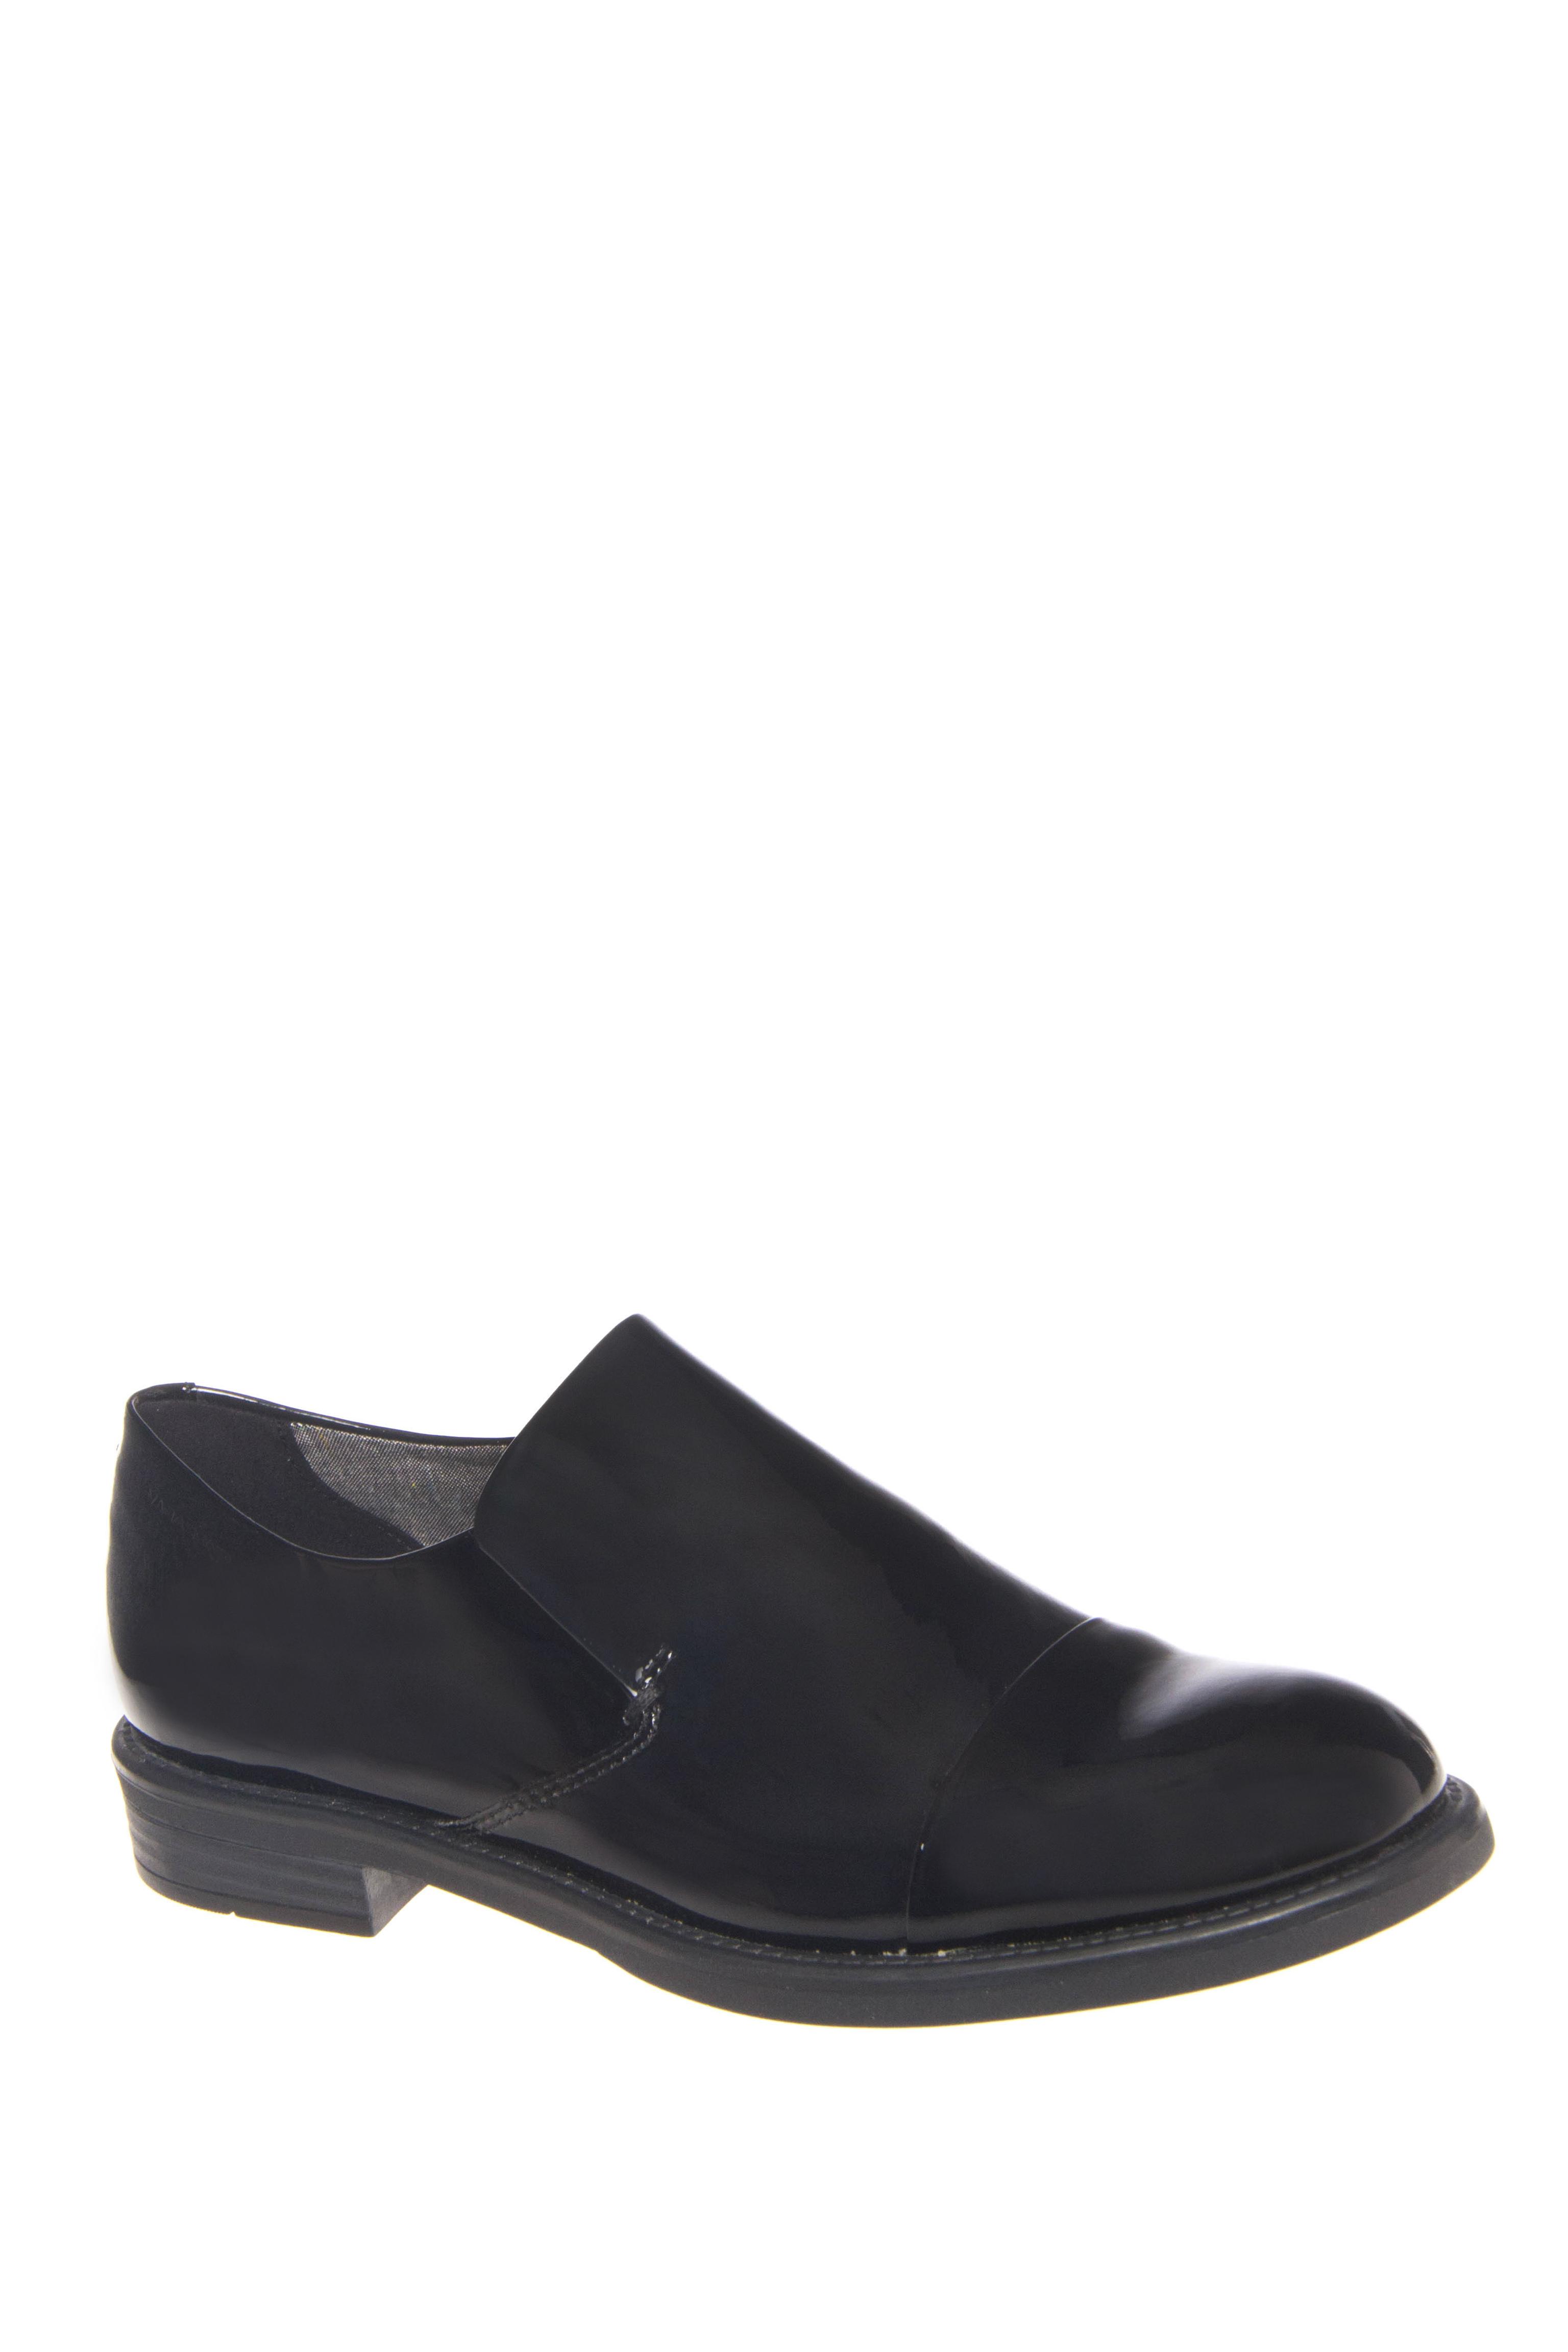 Vagabond Amina Low Heel Patent Loafers - Black